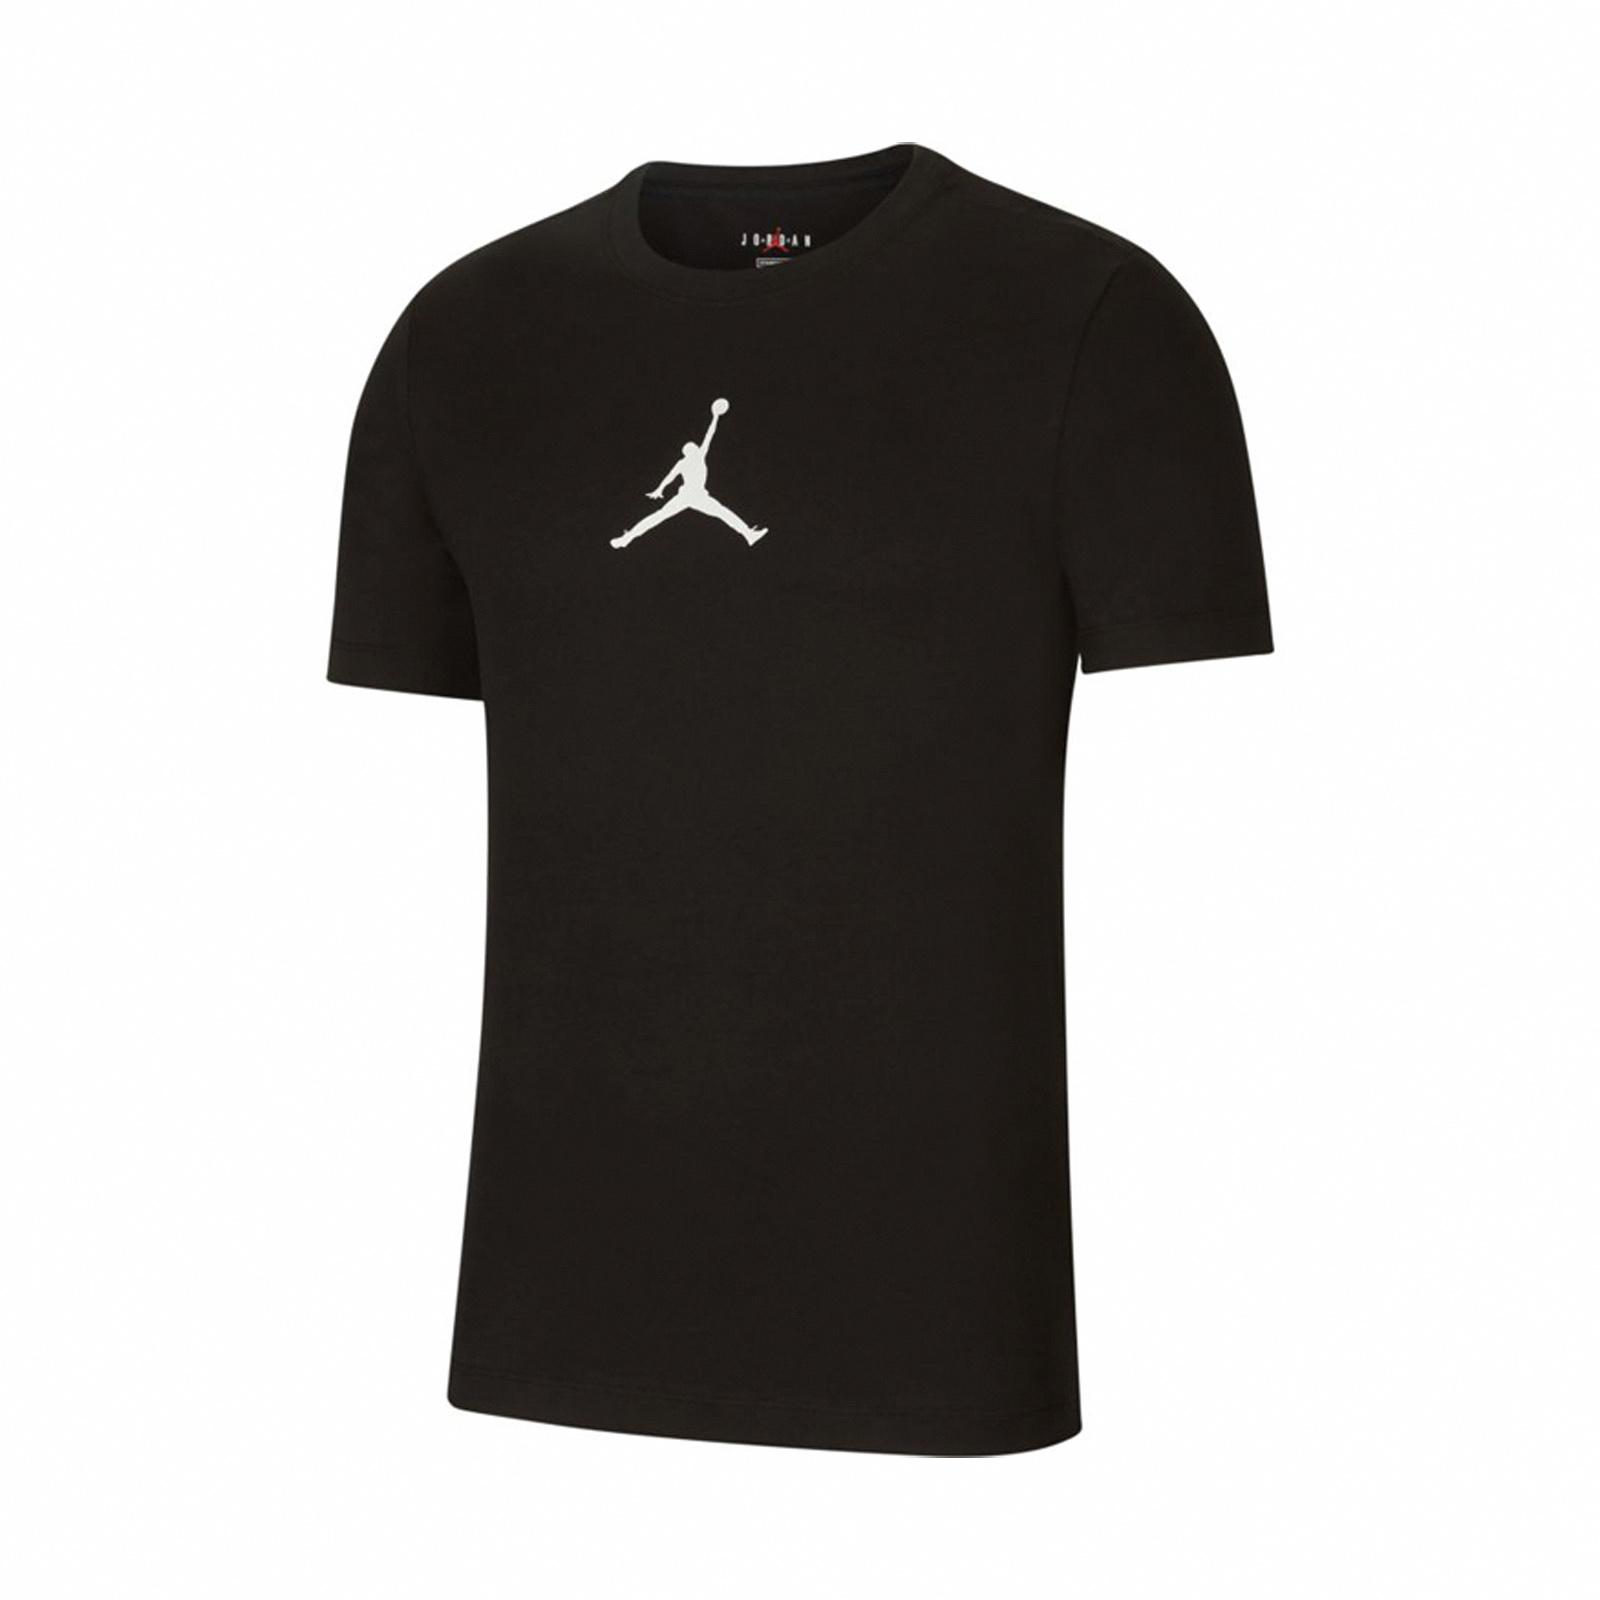 Nike 短袖T恤 Jordan Jumpman Tee 黑 白 男款 短T 喬丹 【ACS】 CW5191-010